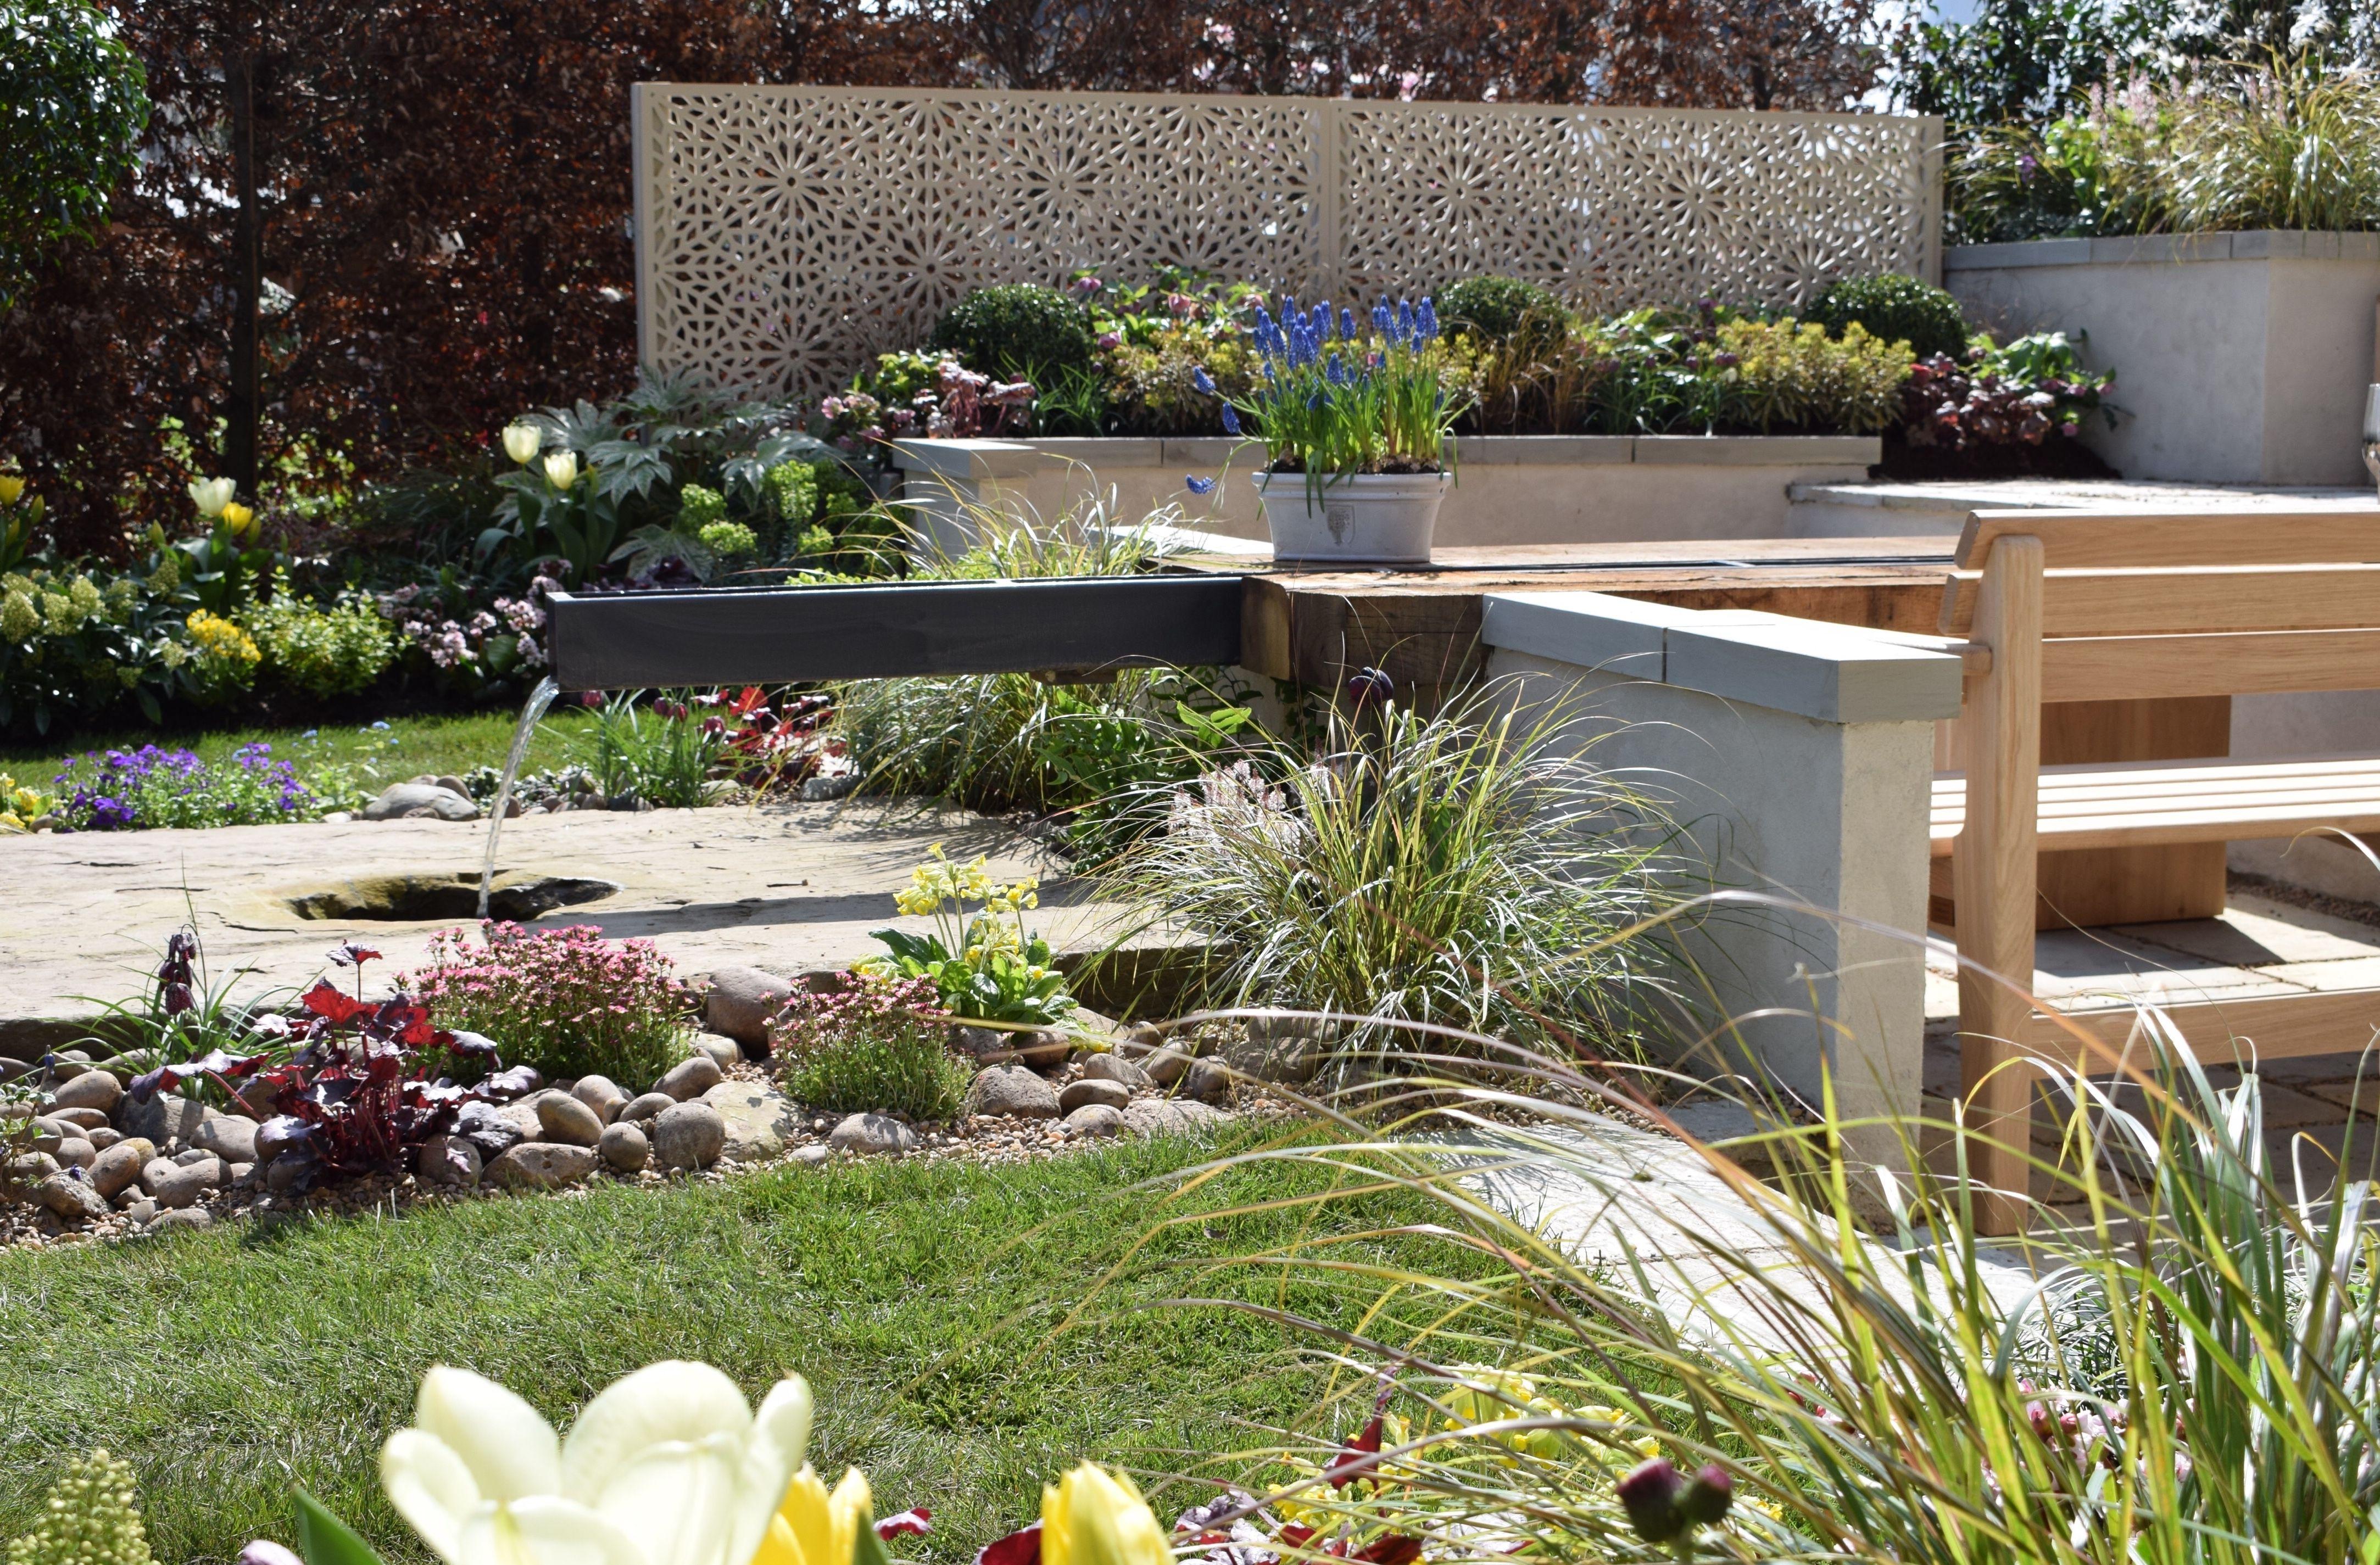 Pip Probert Yardley Flower Garden Ascot Garden Festival Garden Design Flower Garden Plants